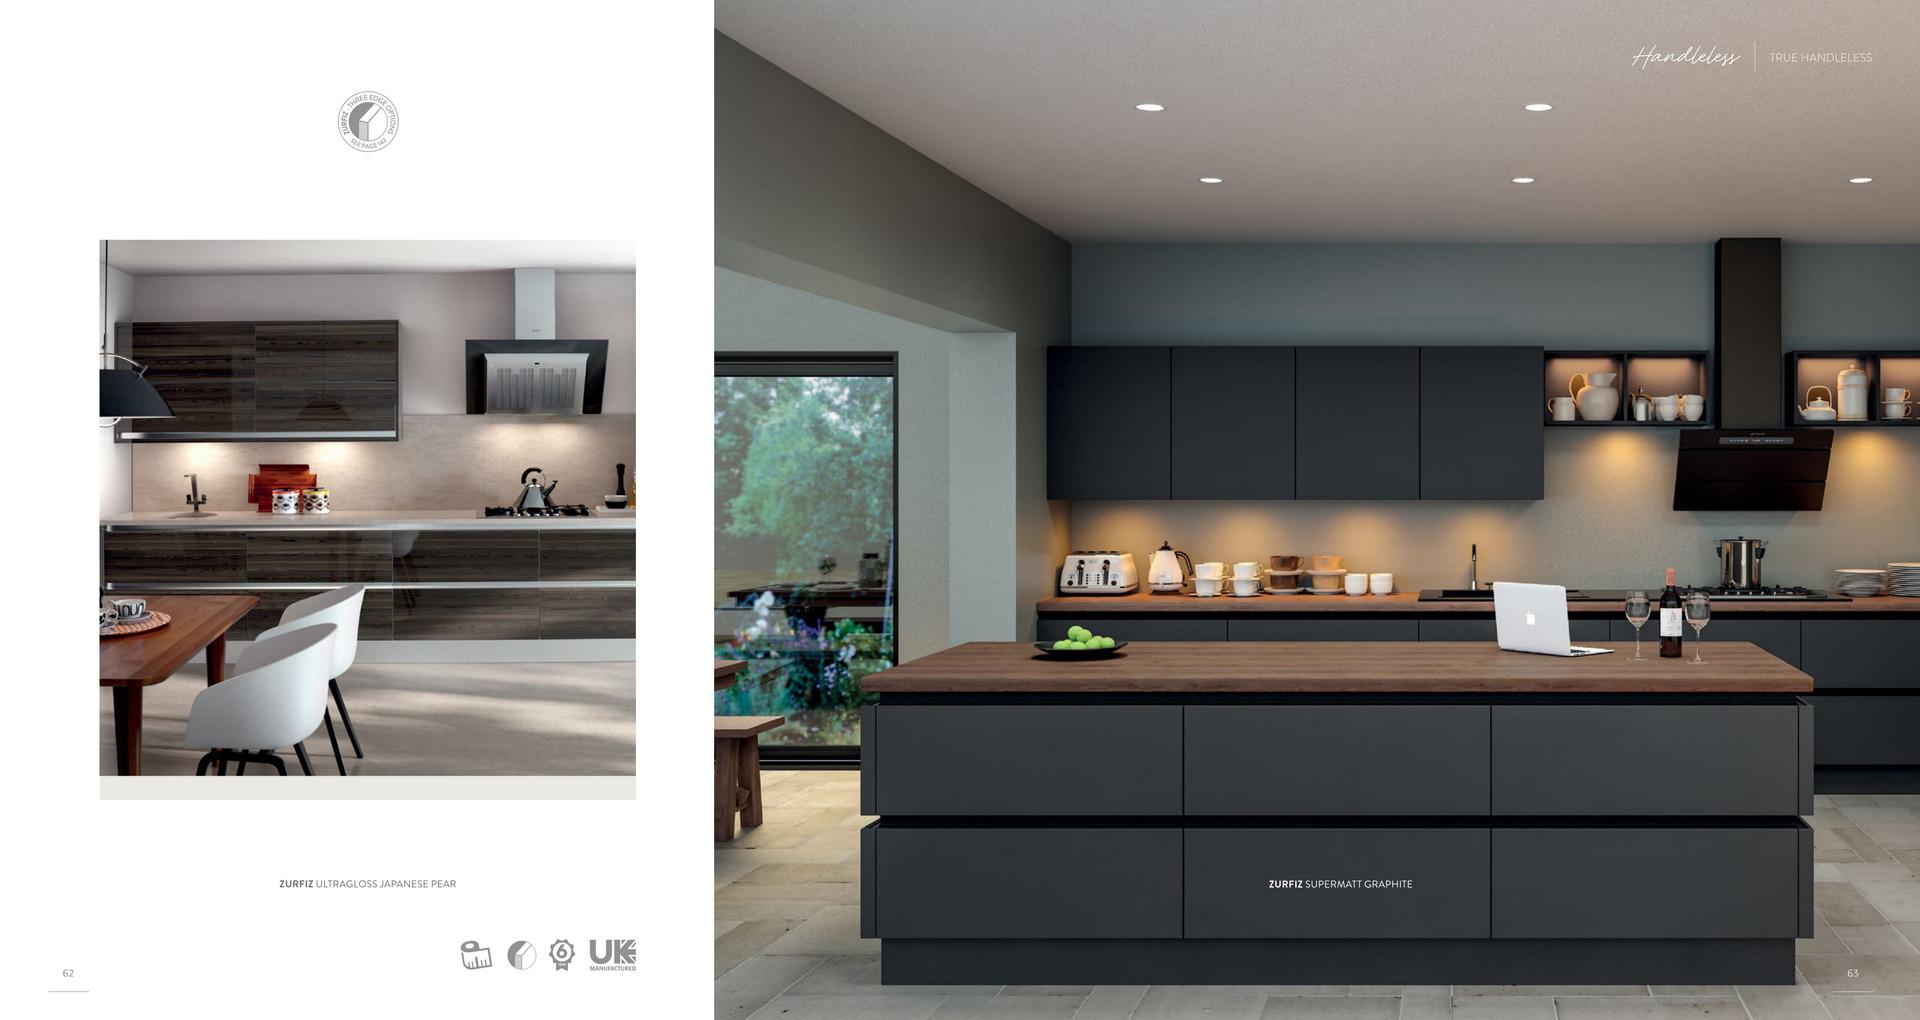 blossom-avenue-kitchen-brochure-2020-32.